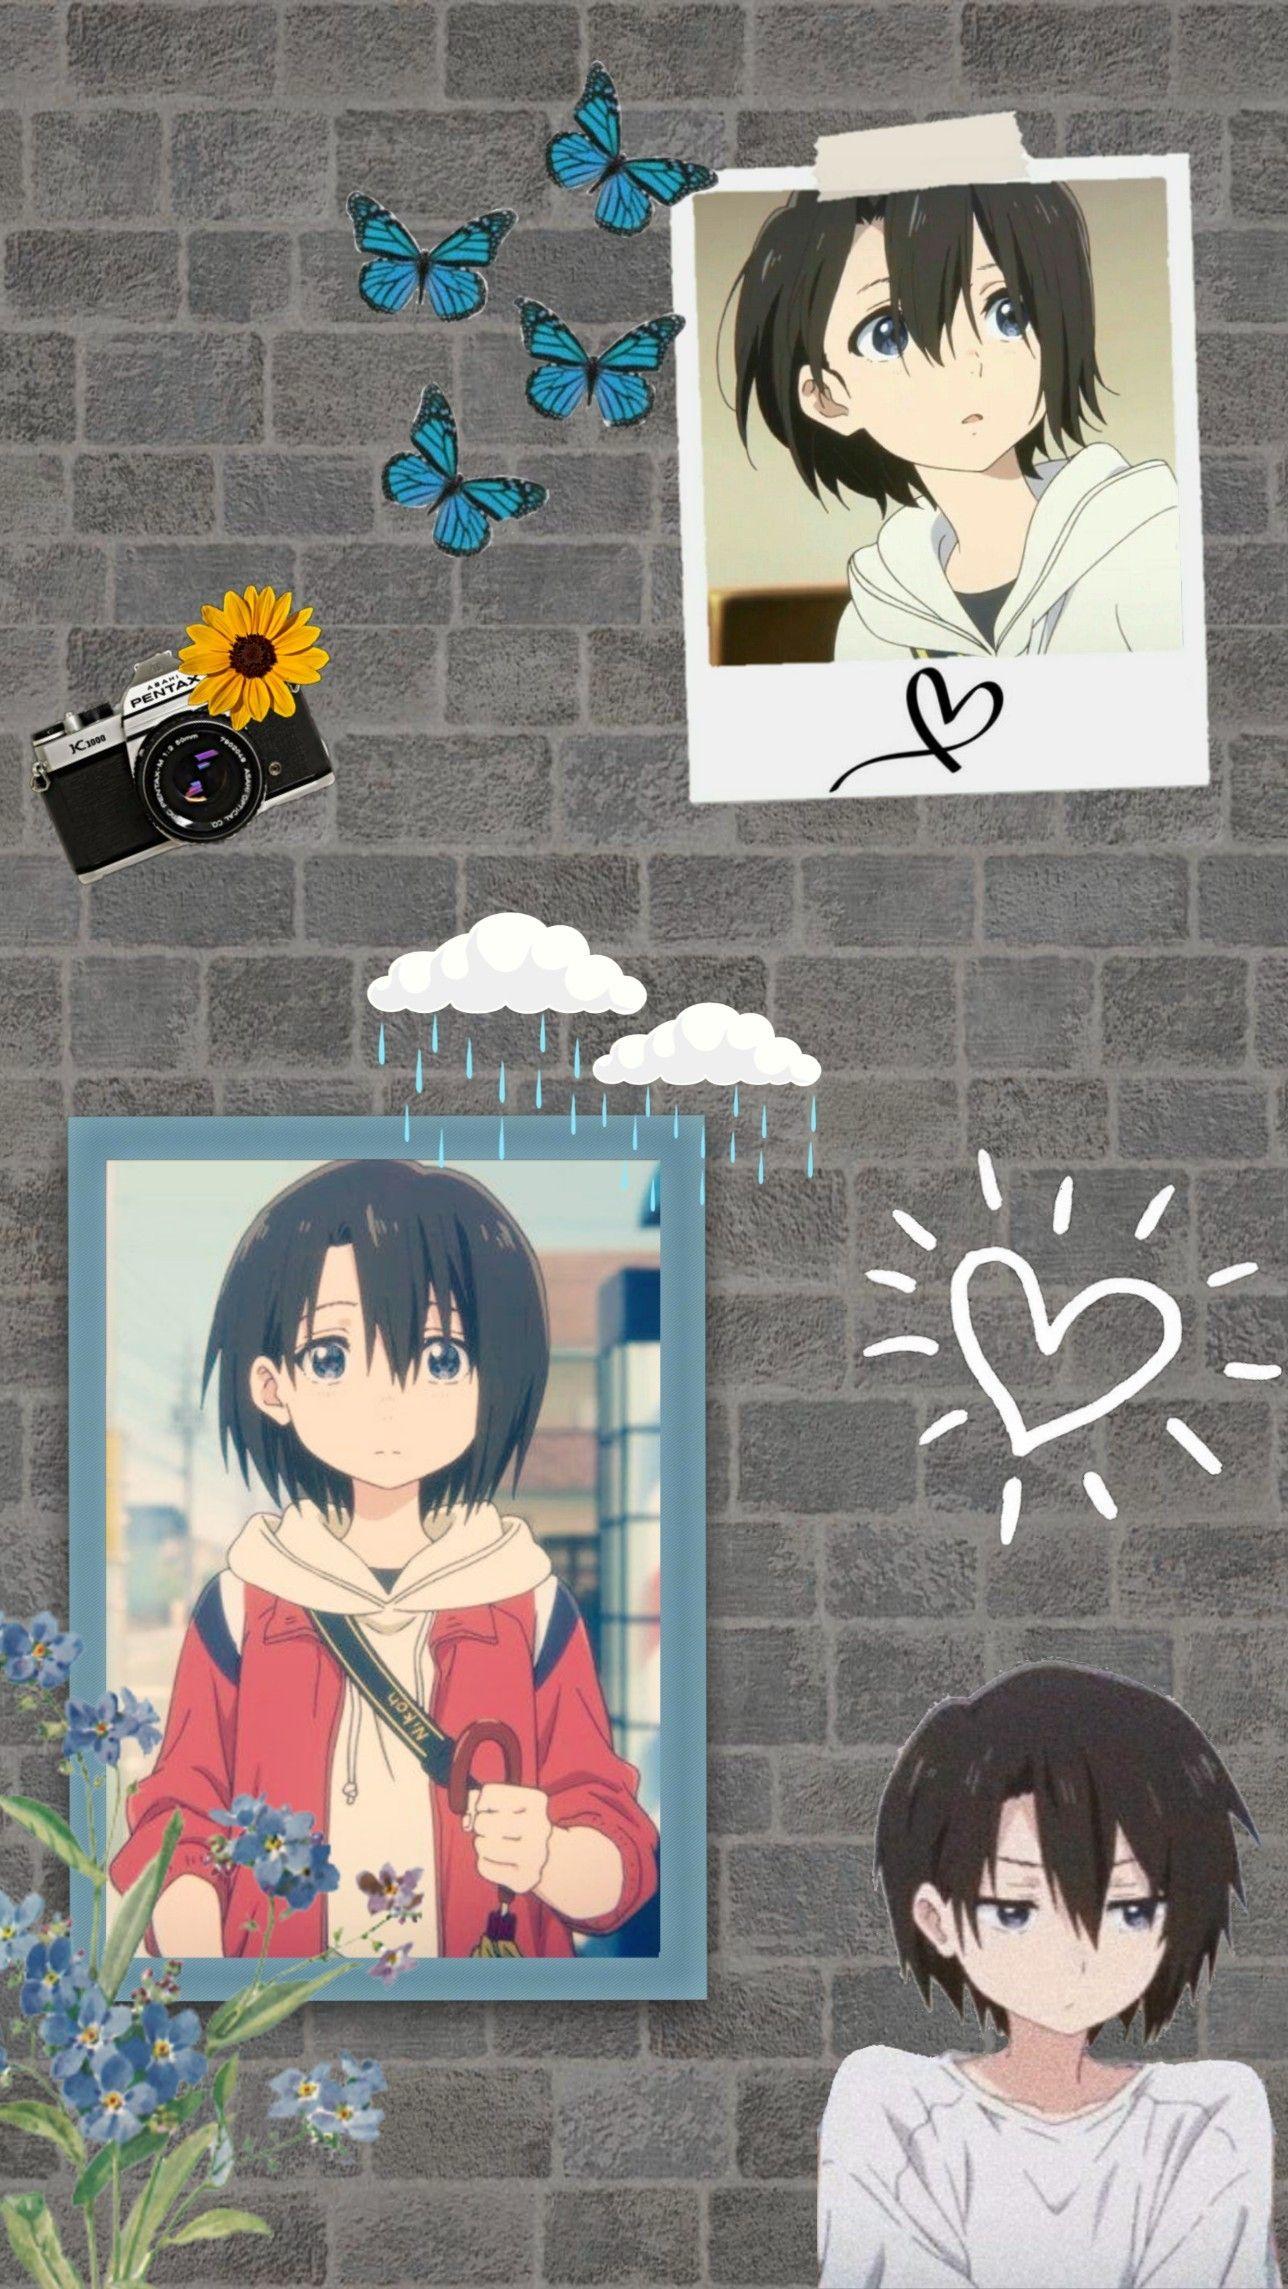 A Silent Voice Yuzuru Aesthetic Wallpaper Cute Anime Wallpaper Anime Wallpaper Anime Films